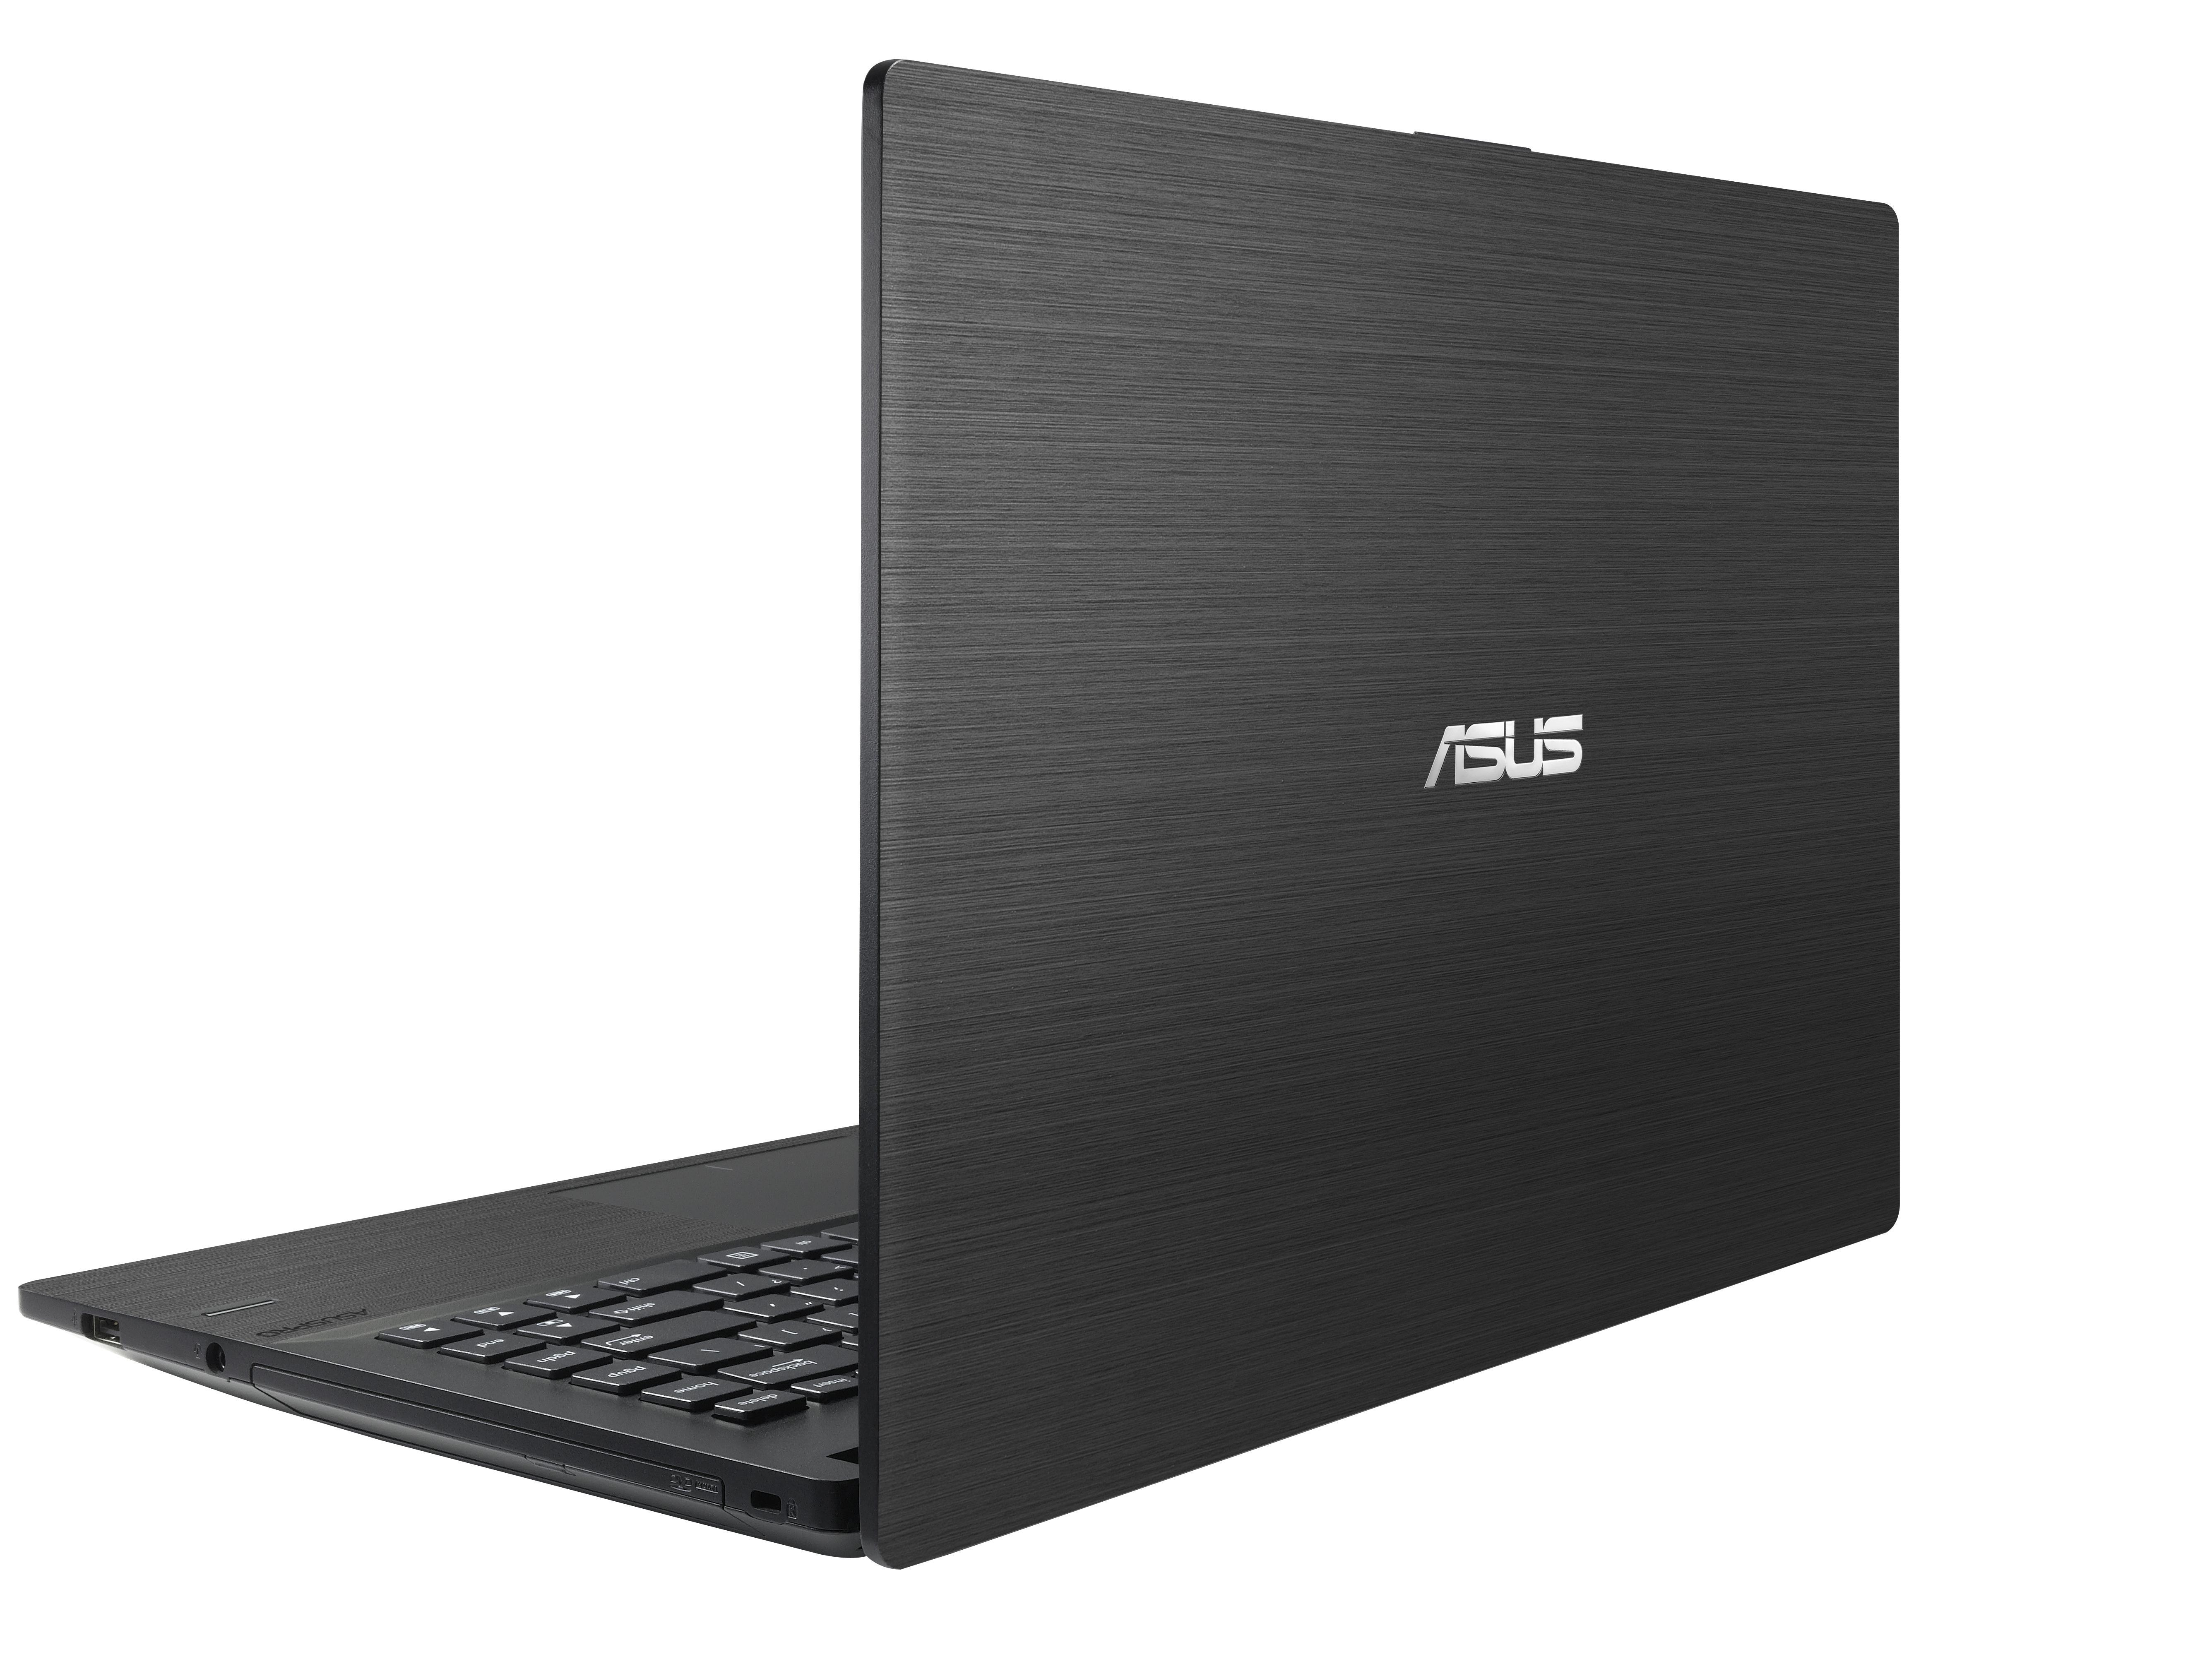 Asus Pro P Essential P2420l Jwo0117e 14 Laptop I5 5200 Daftar A456ur Wx039d Notebook Red Inch 6200u 4 Gb 1 Tb Dos Jpeg Original 126mb